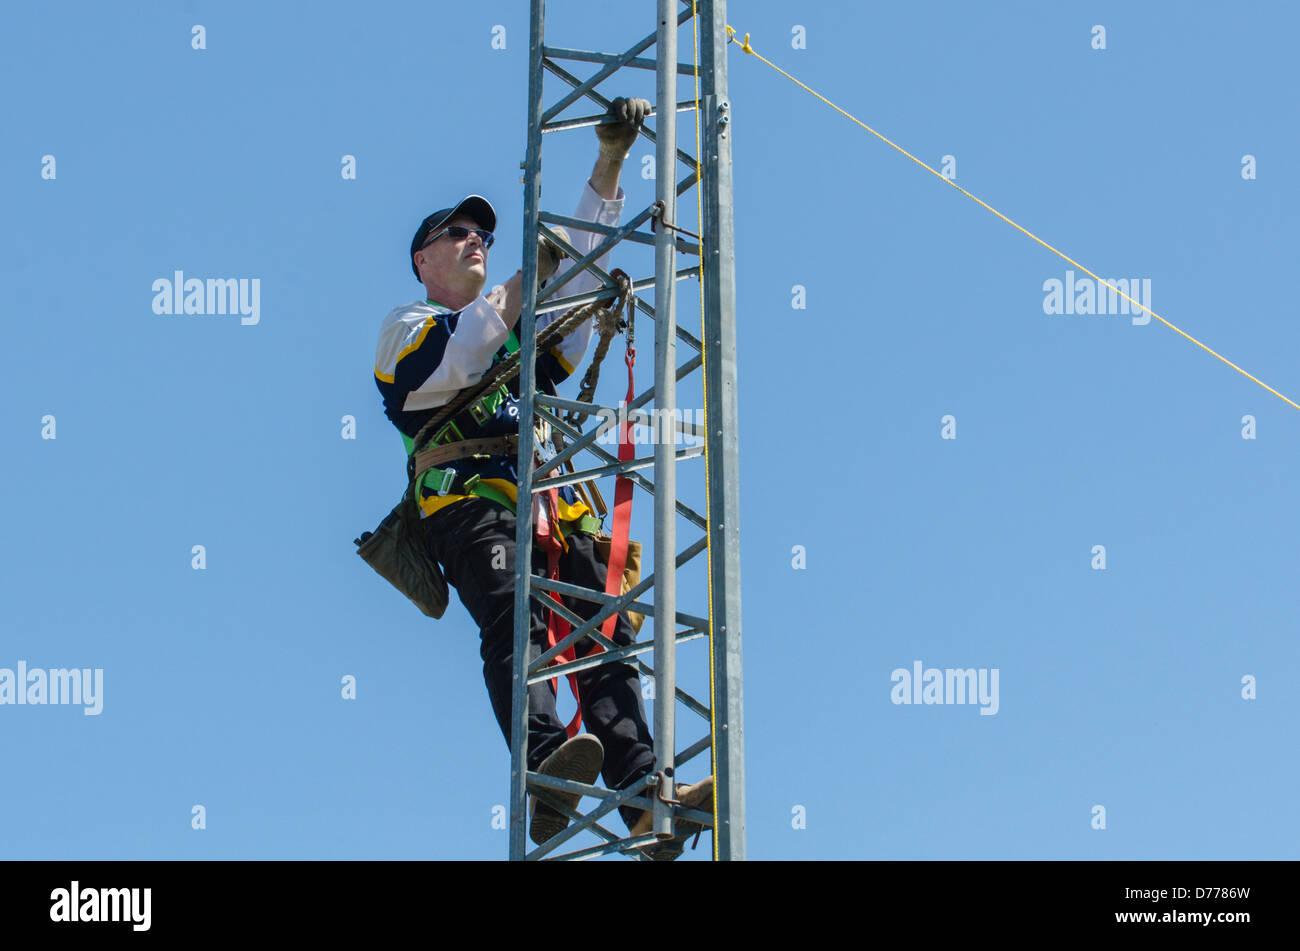 Amateur Radio Tower Stock Photos & Amateur Radio Tower Stock